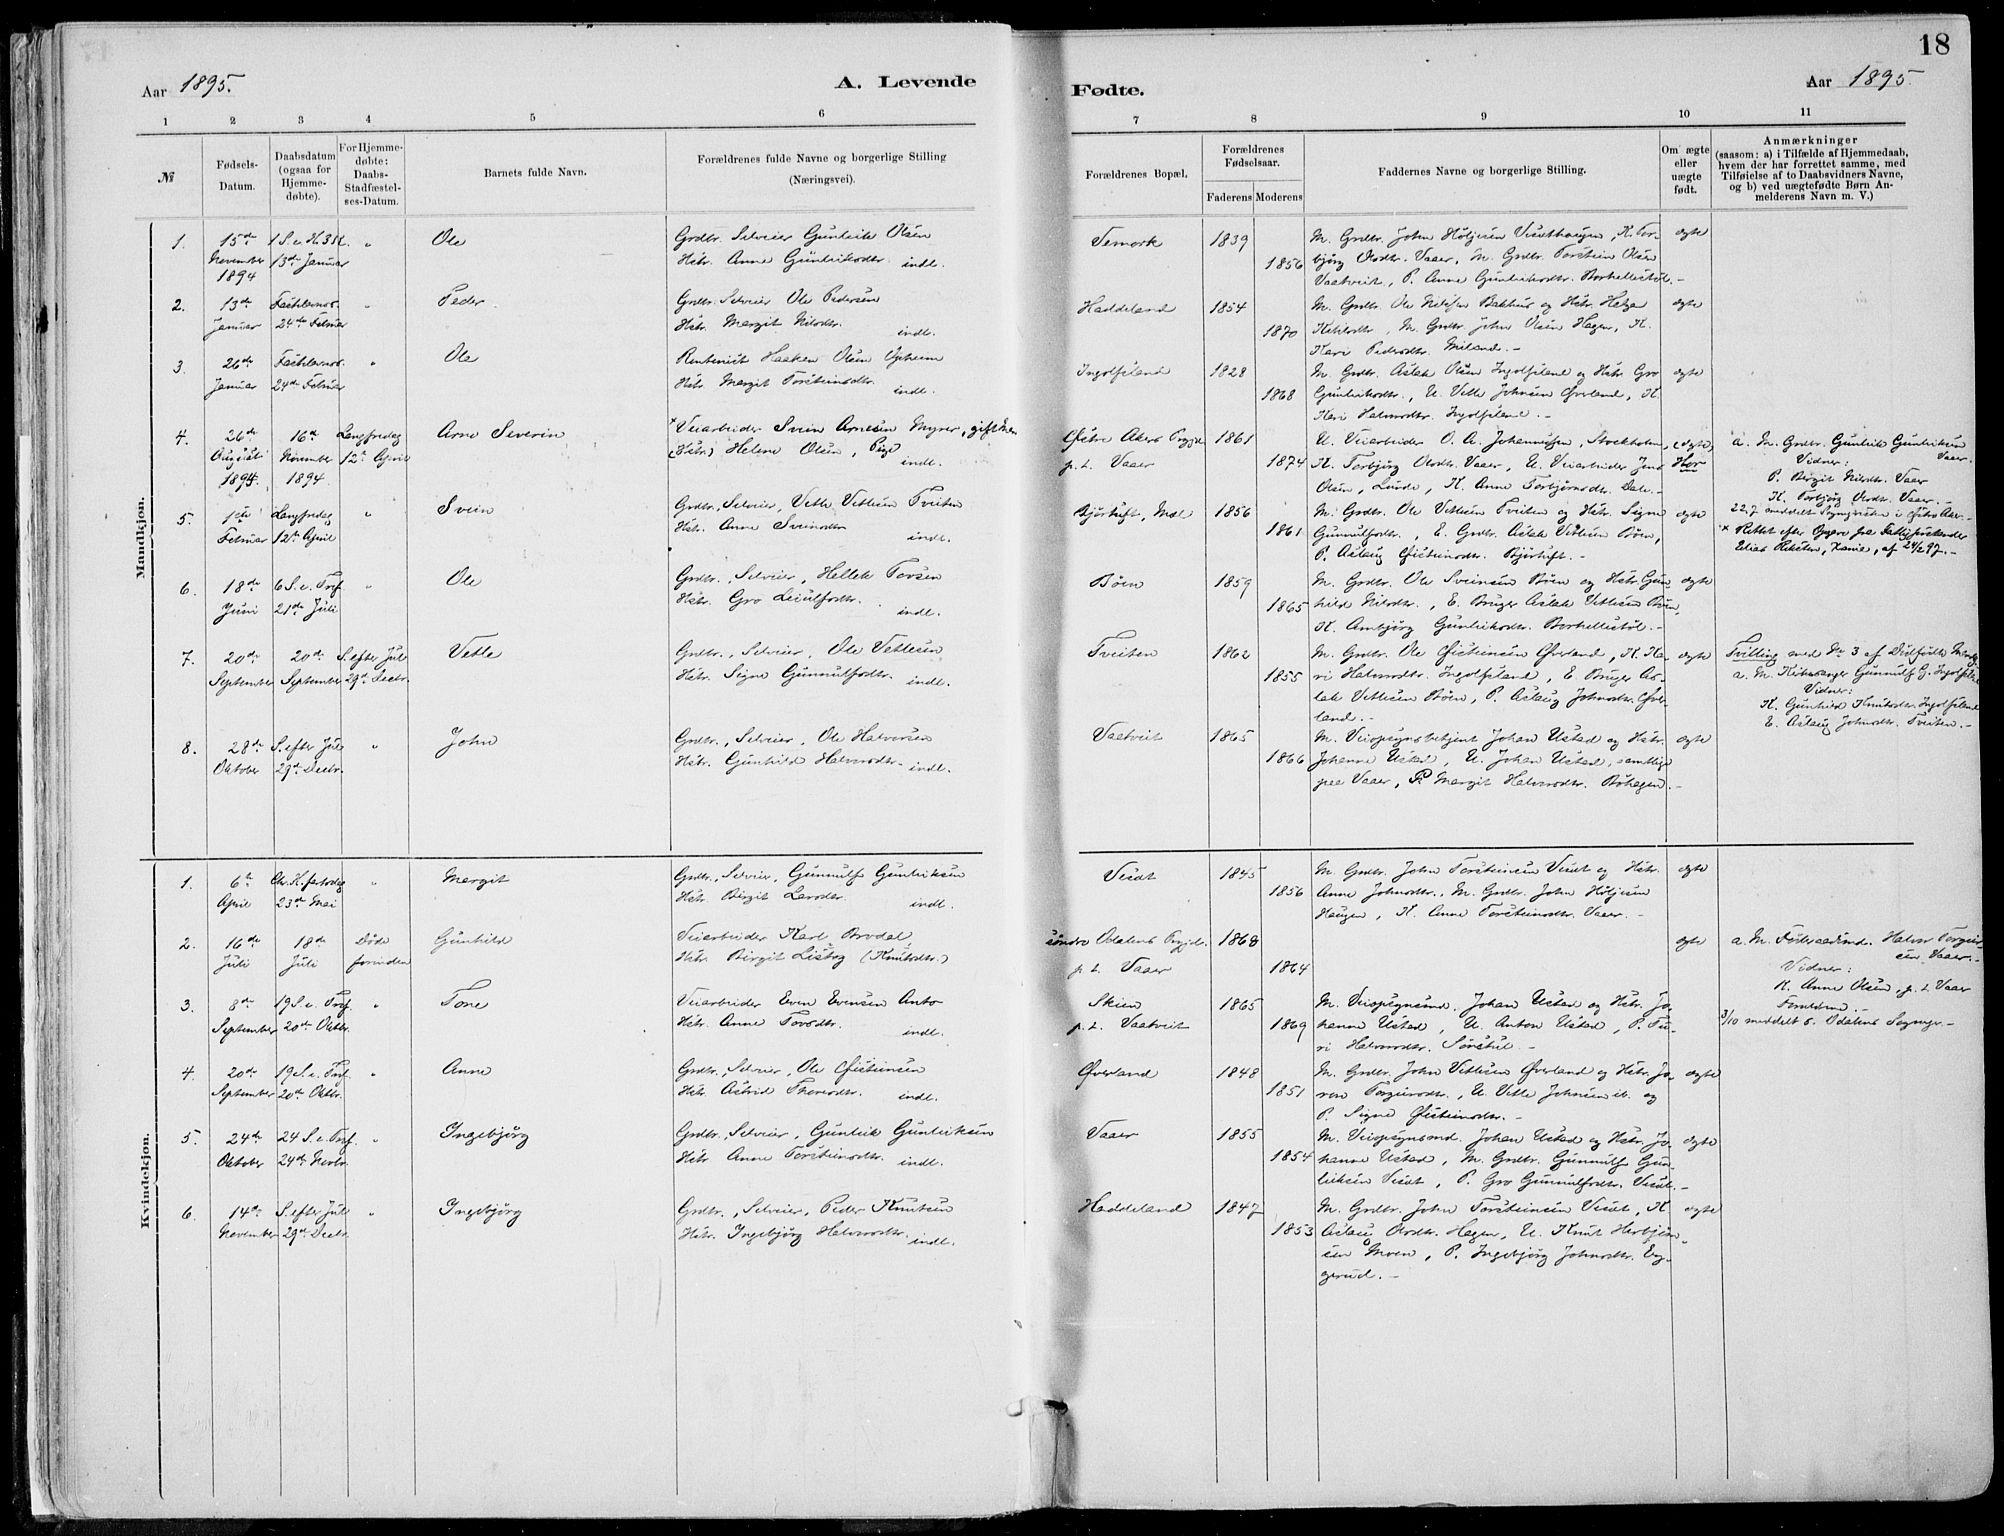 SAKO, Rjukan kirkebøker, F/Fa/L0001: Ministerialbok nr. 1, 1878-1912, s. 18